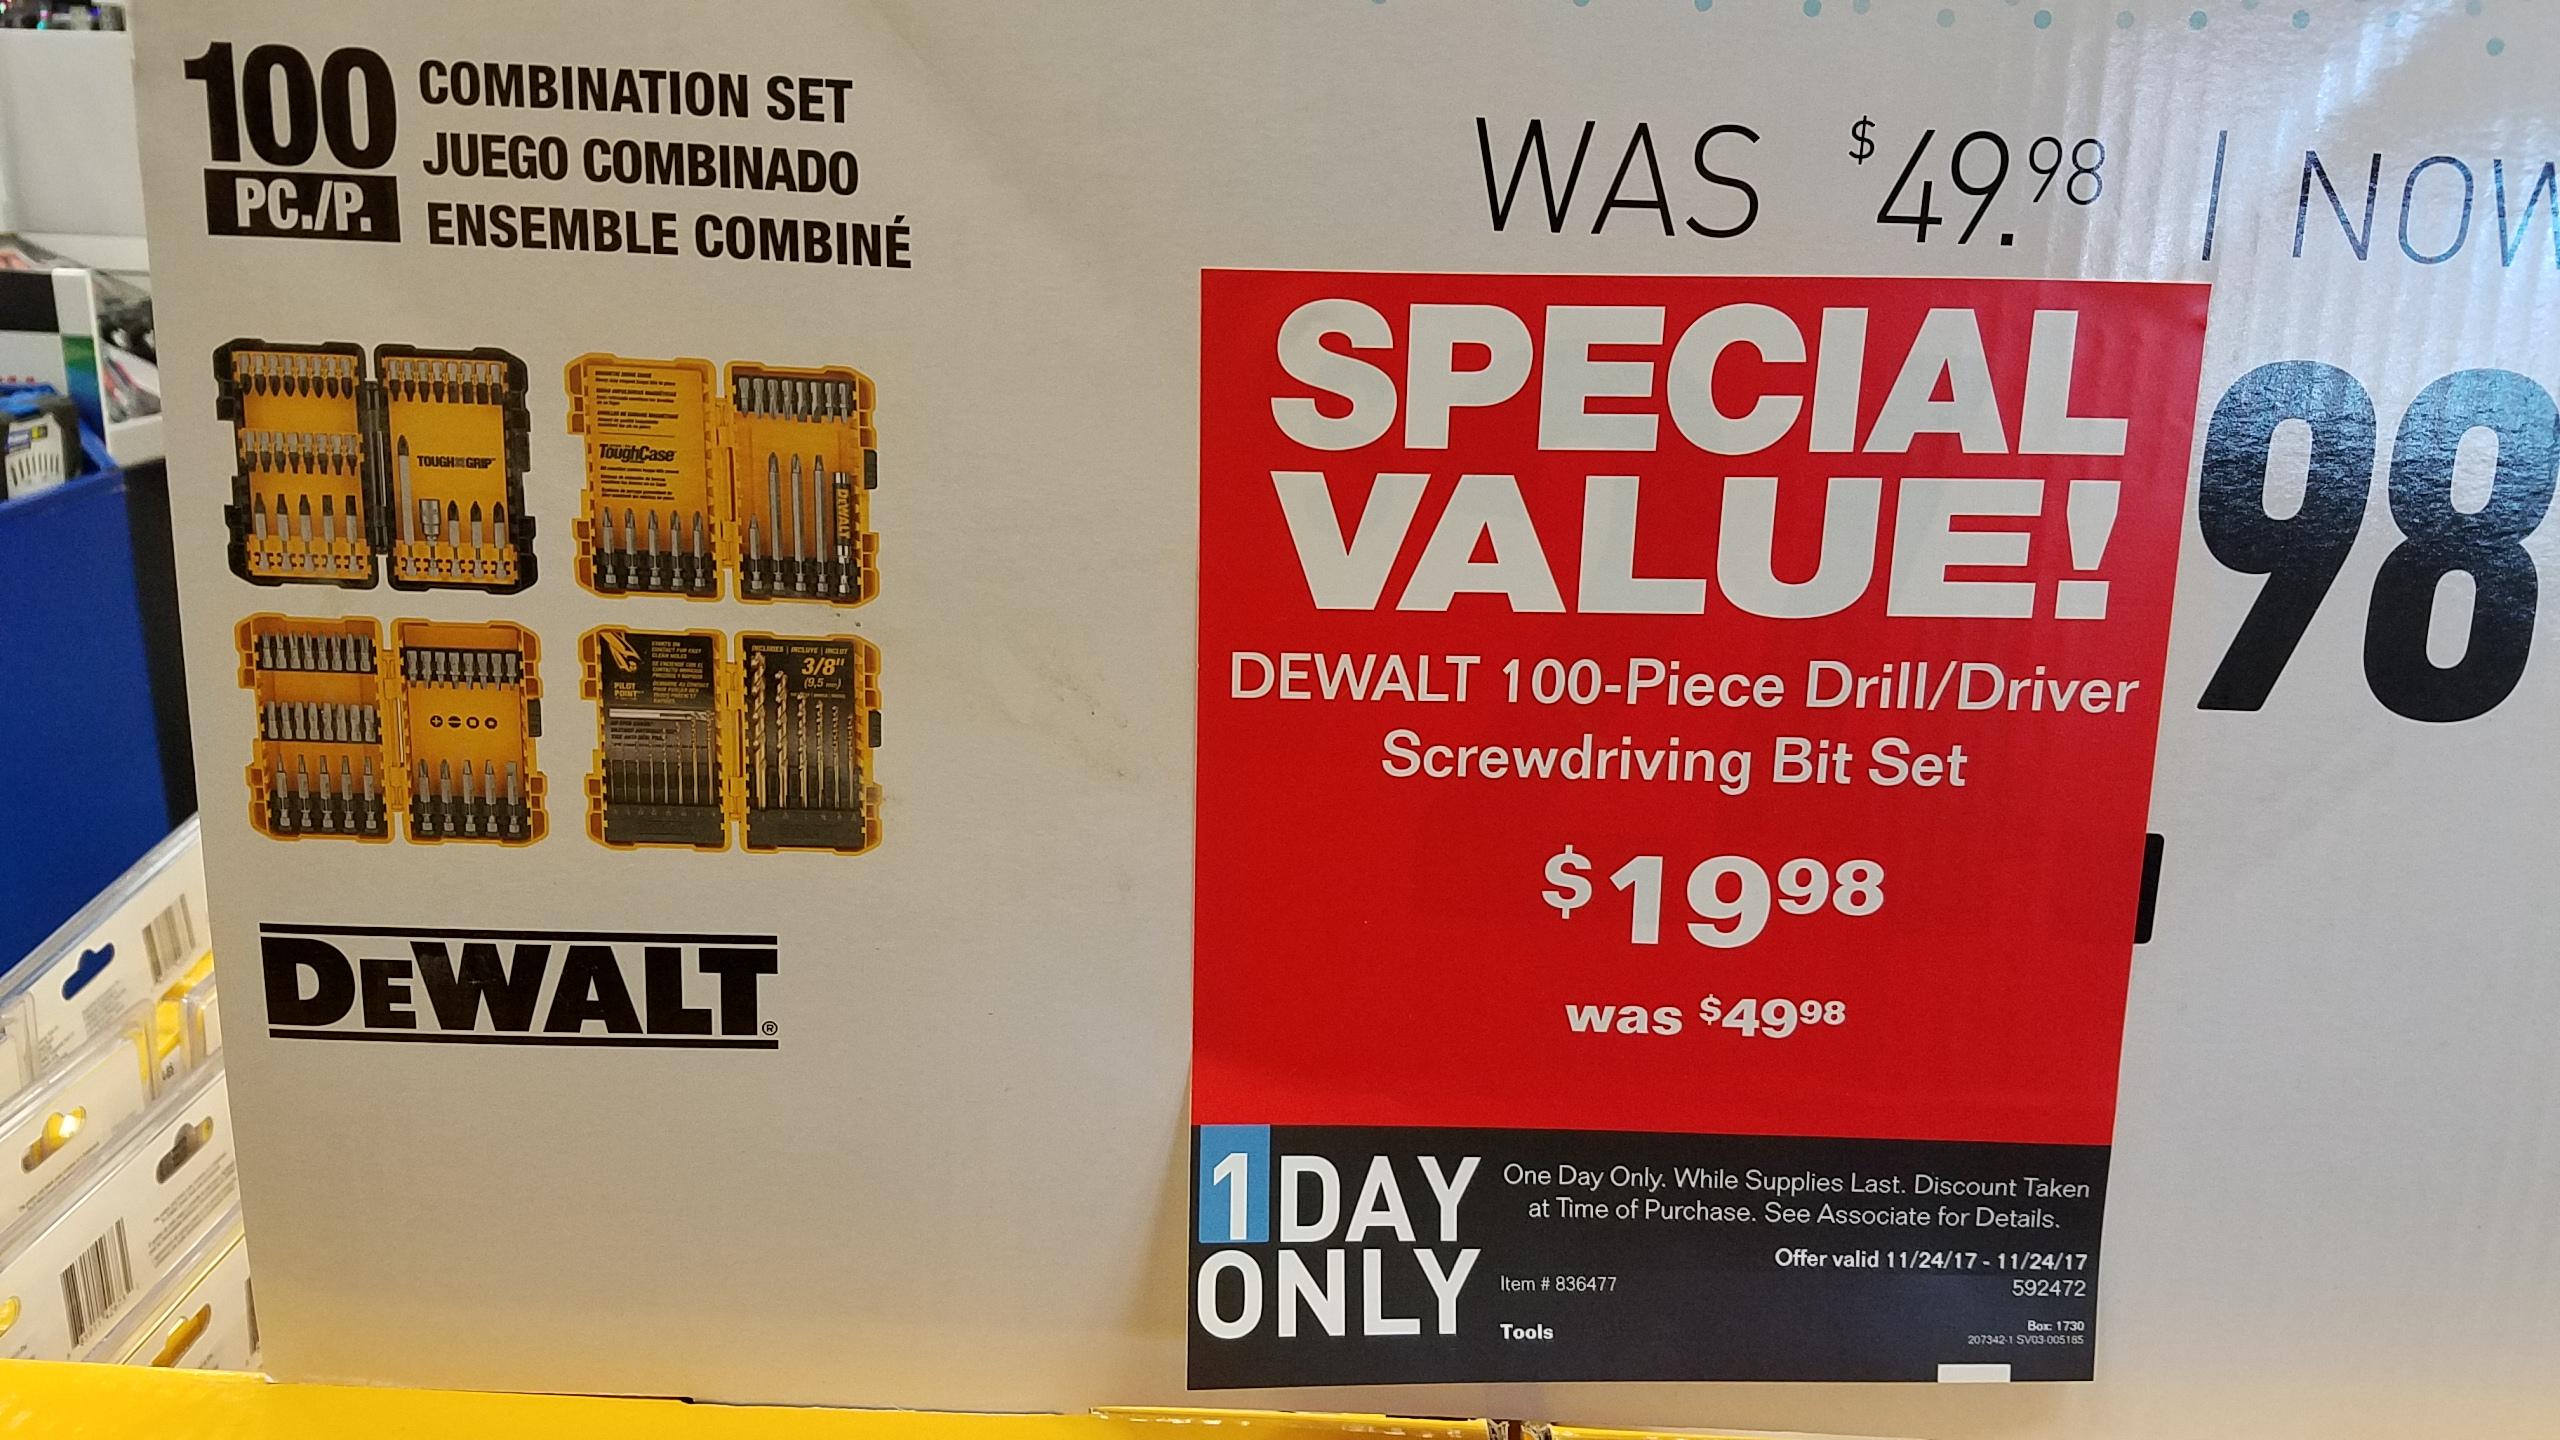 Lowe's In-store - Dewalt 100 piece Drill/Driver set $19.98